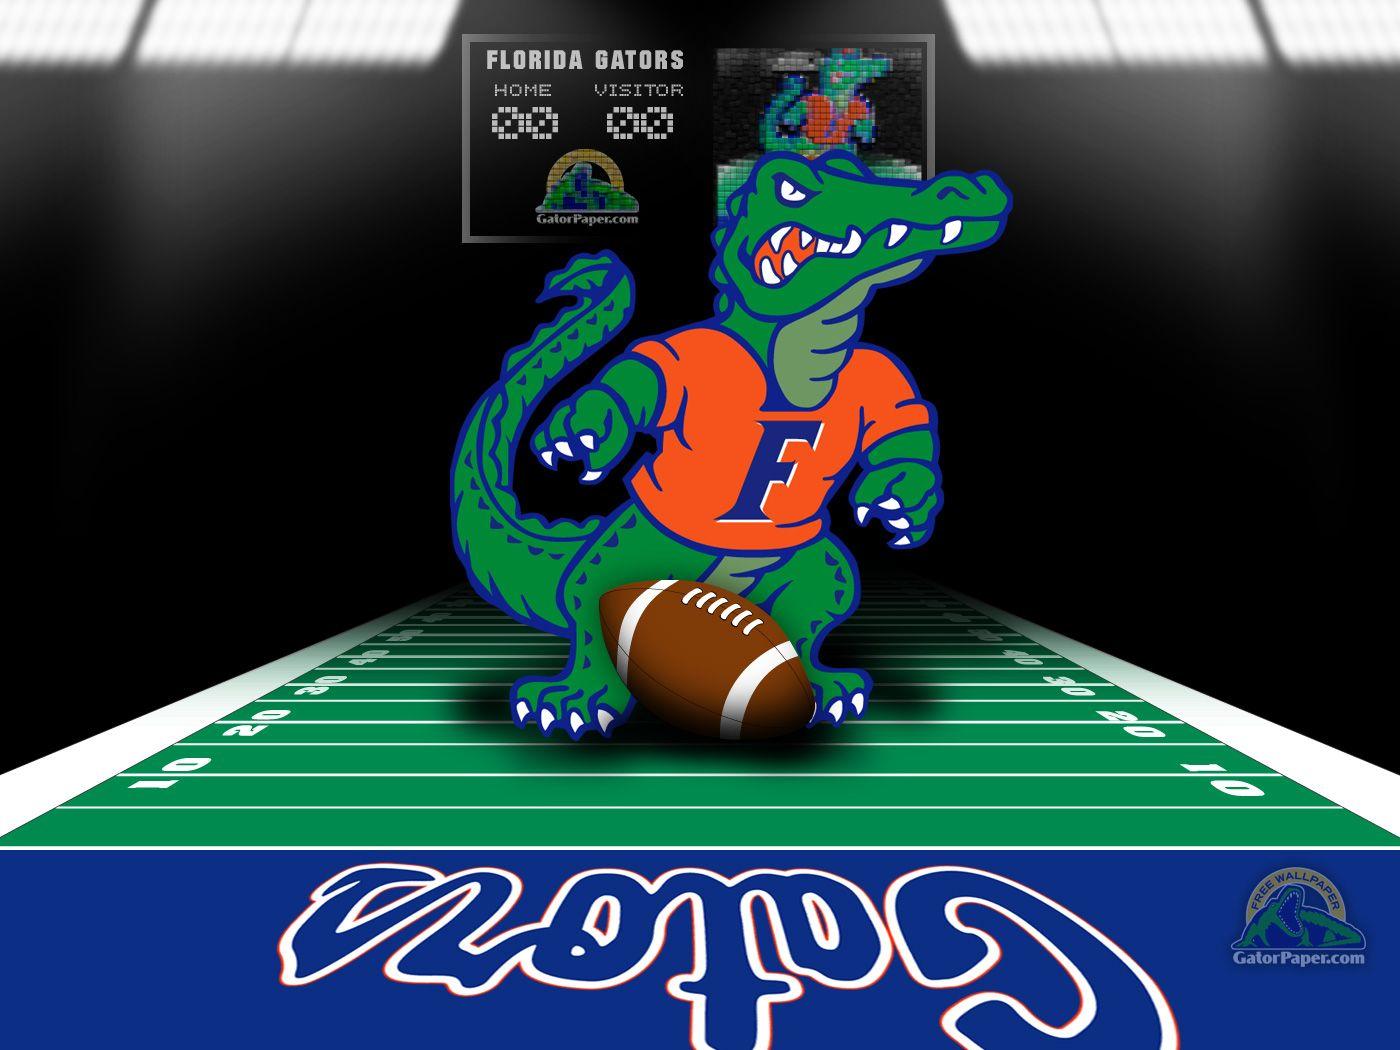 Free Florida Gators Wallpaper | ... Florida Gators Football Wallpaper  Cachedwere Upgrading To Gator